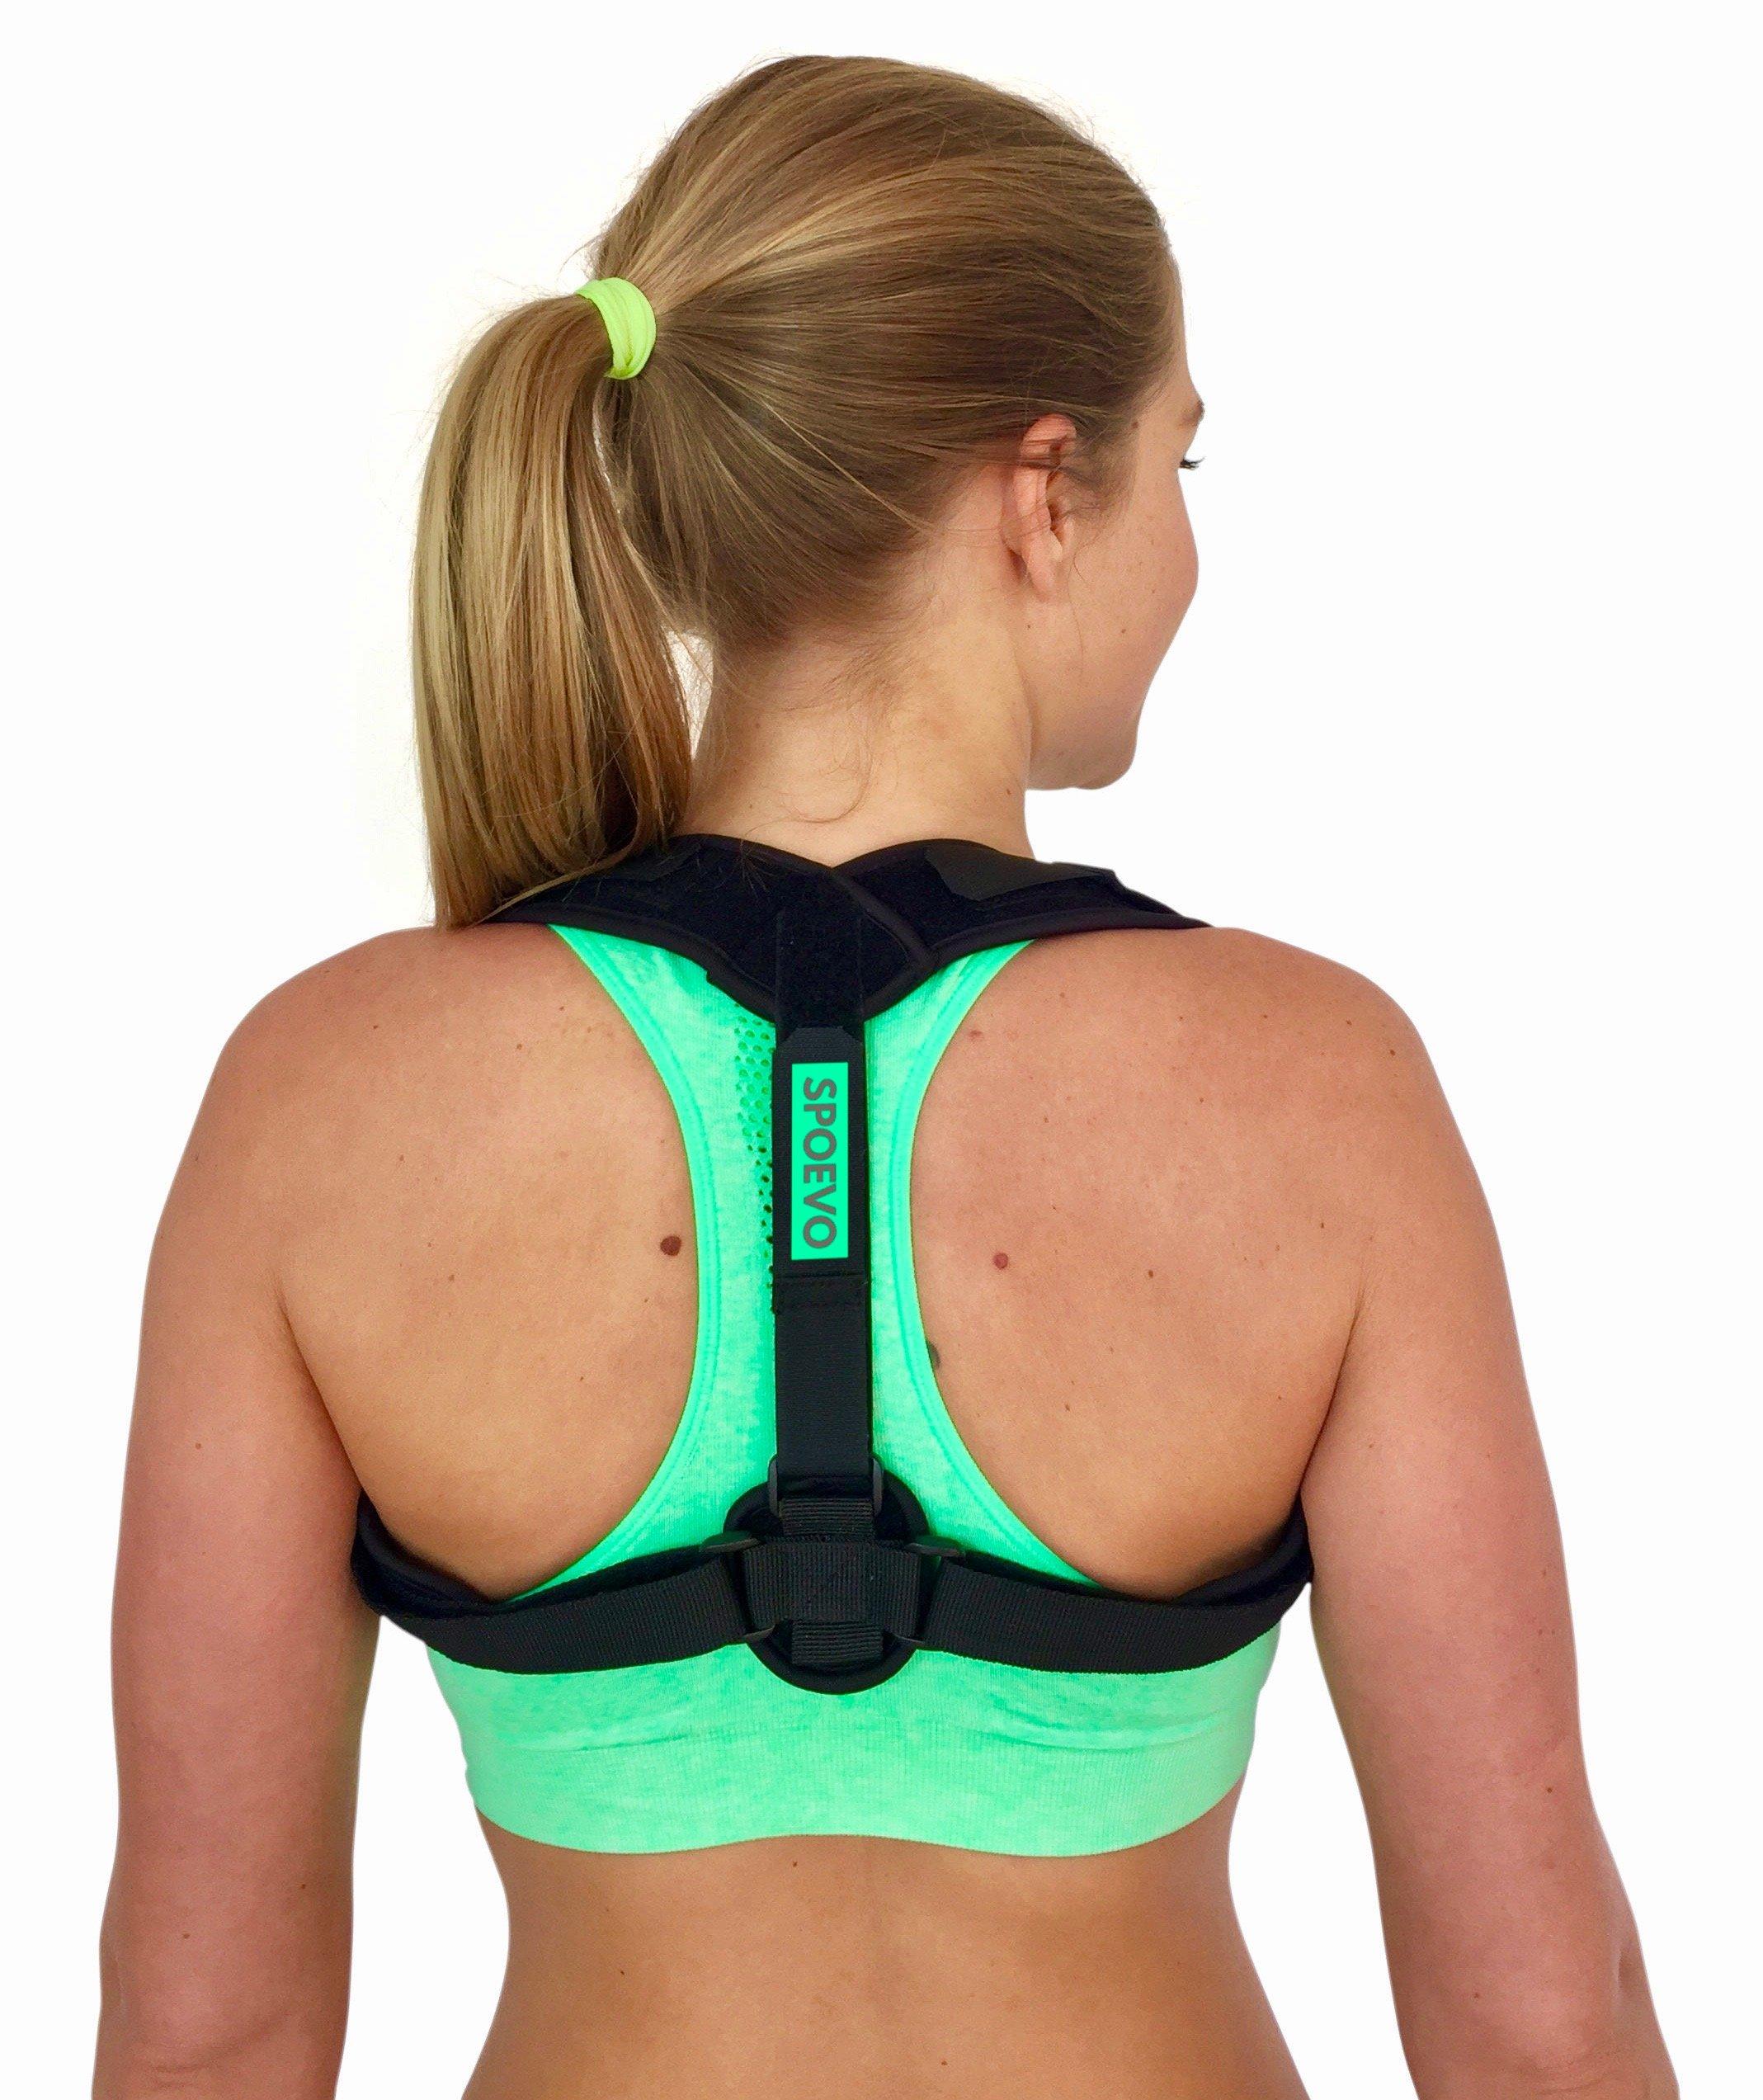 SPOEVO Back Posture Corrector for Women & Men - Bundle Includes Massage Ball & Resistance Band with Back Straightener Posture Brace for Natural Spine Alignment